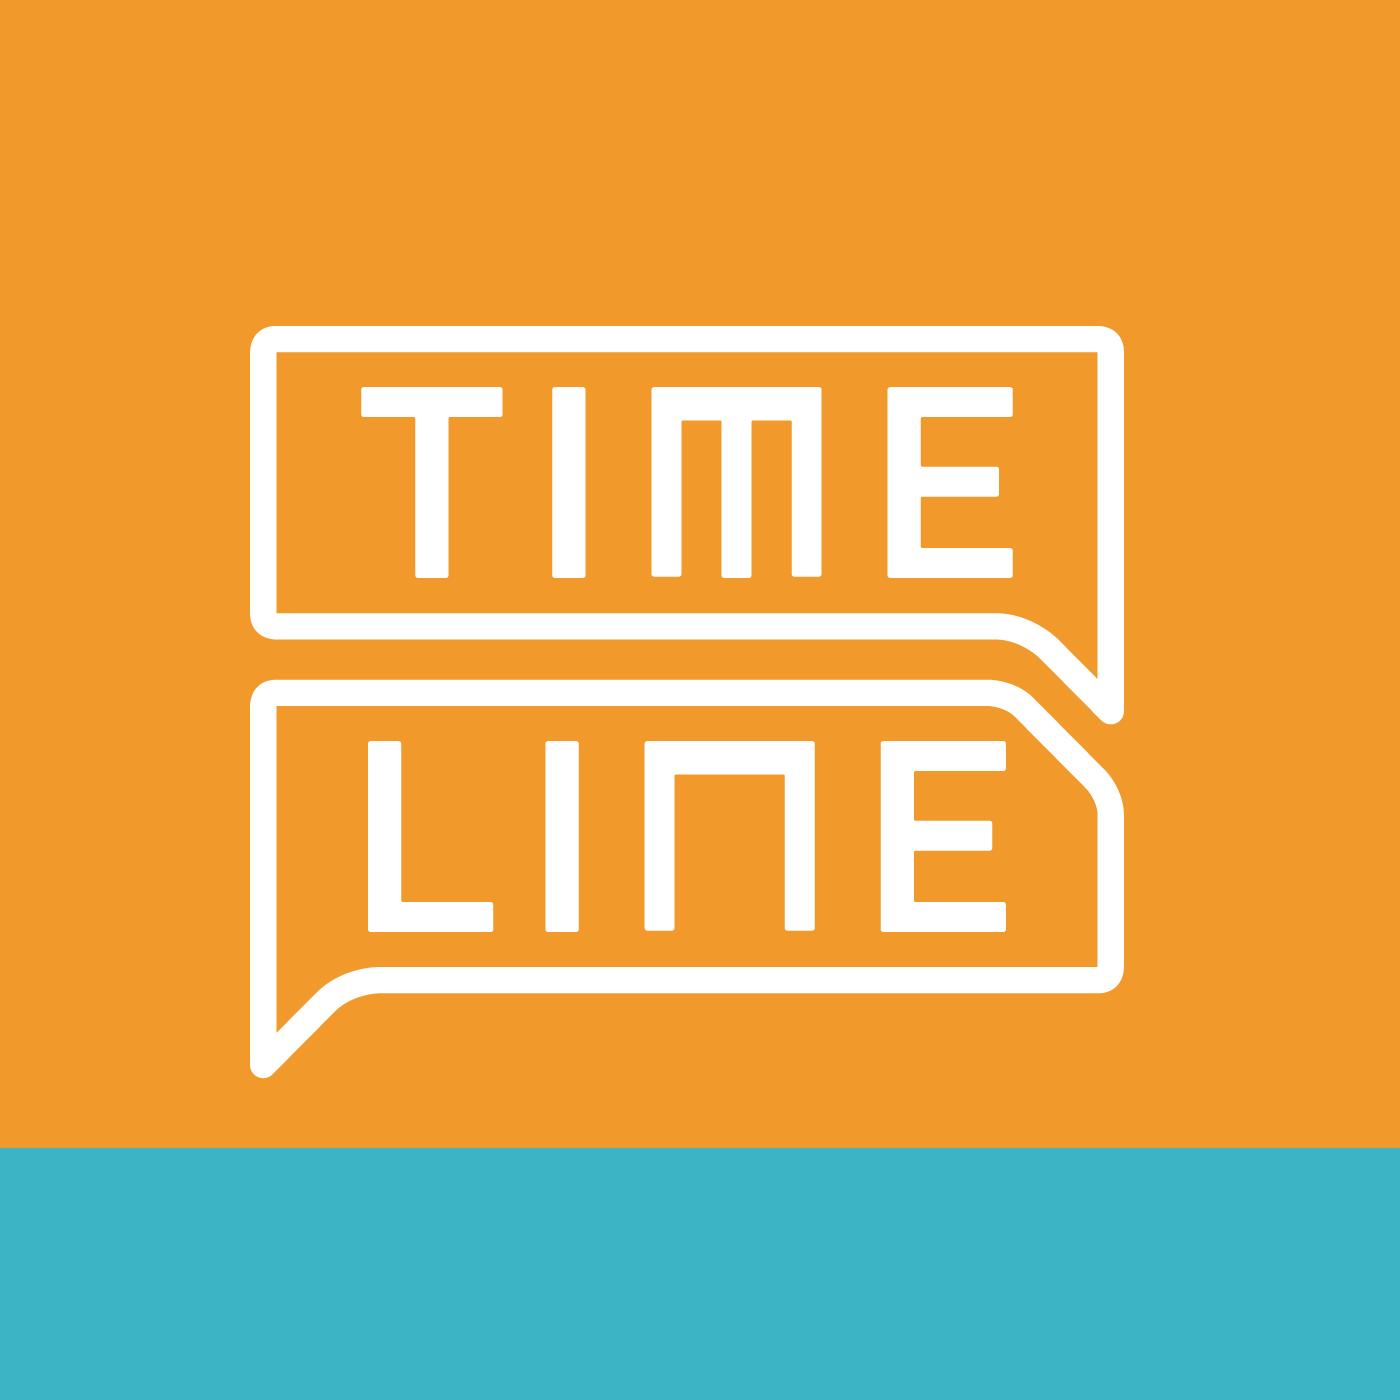 Timeline Gaúcha 20/09/2017